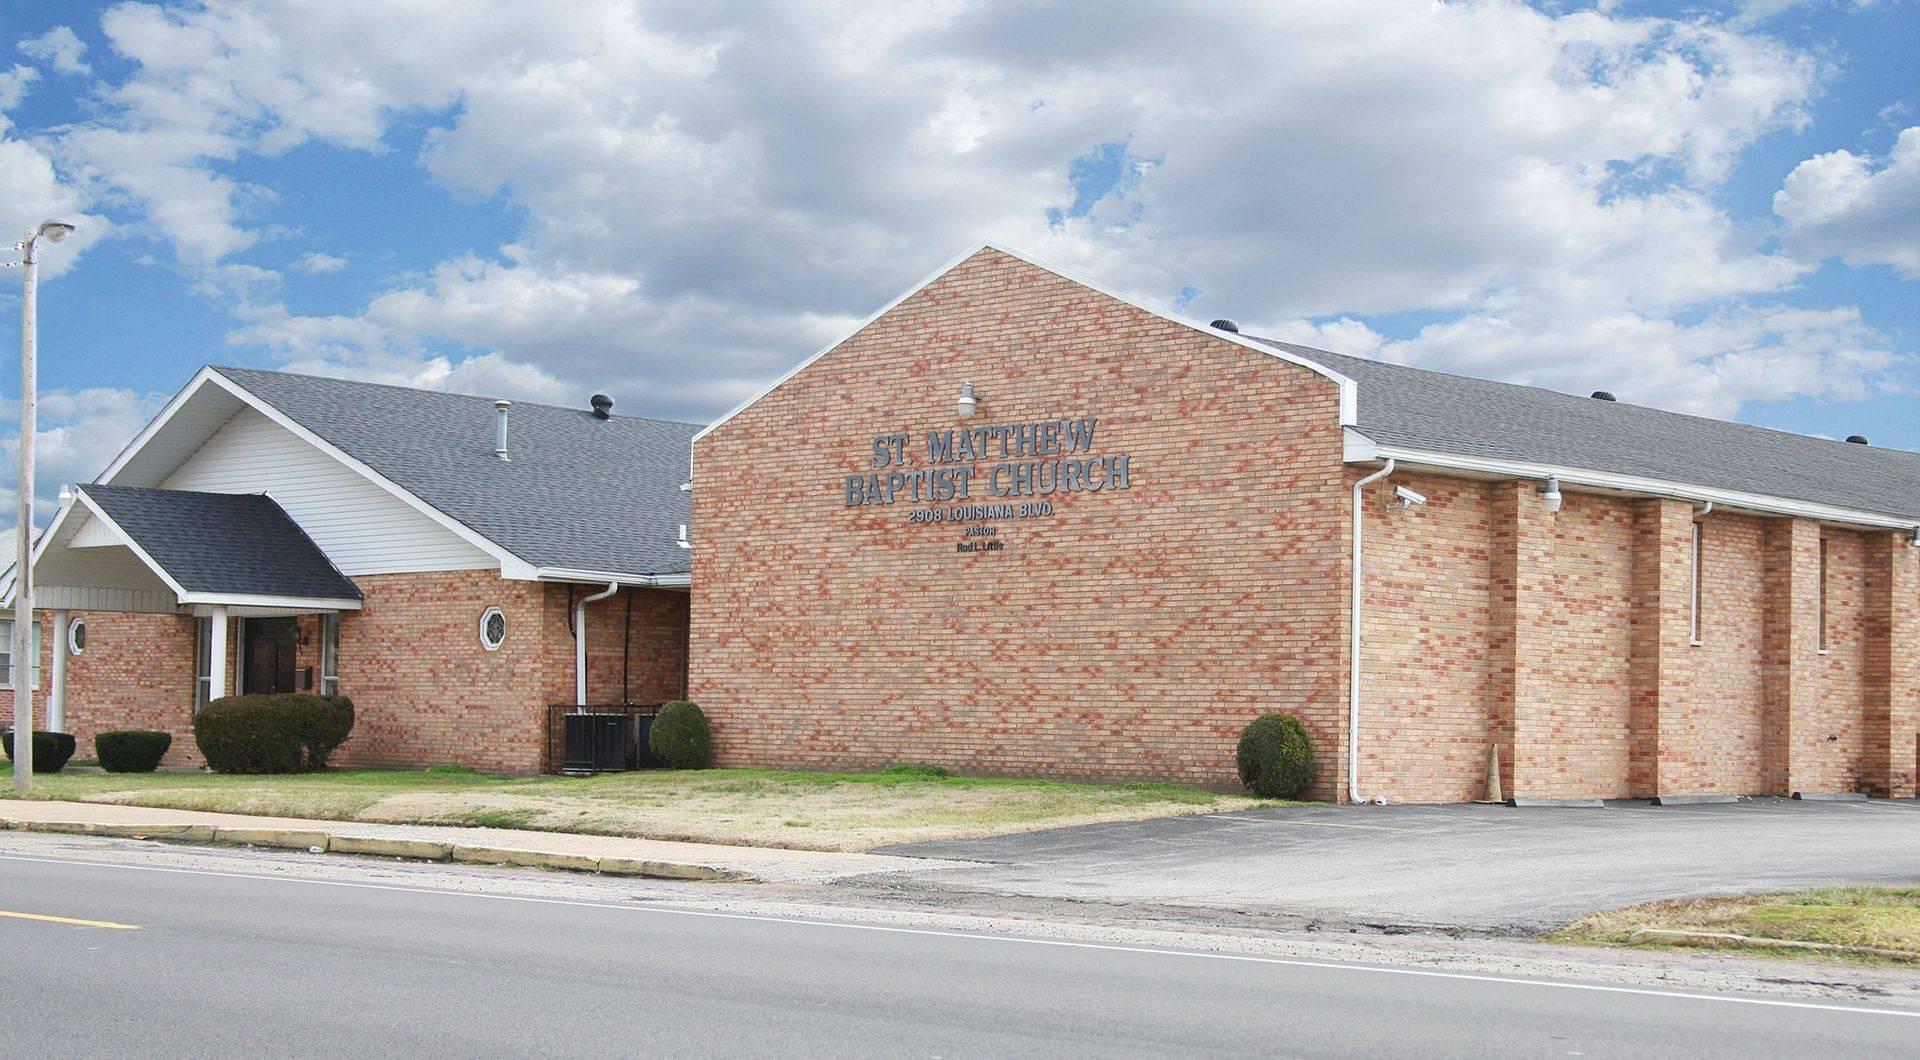 St. Matthew's Baptist Food Pantry